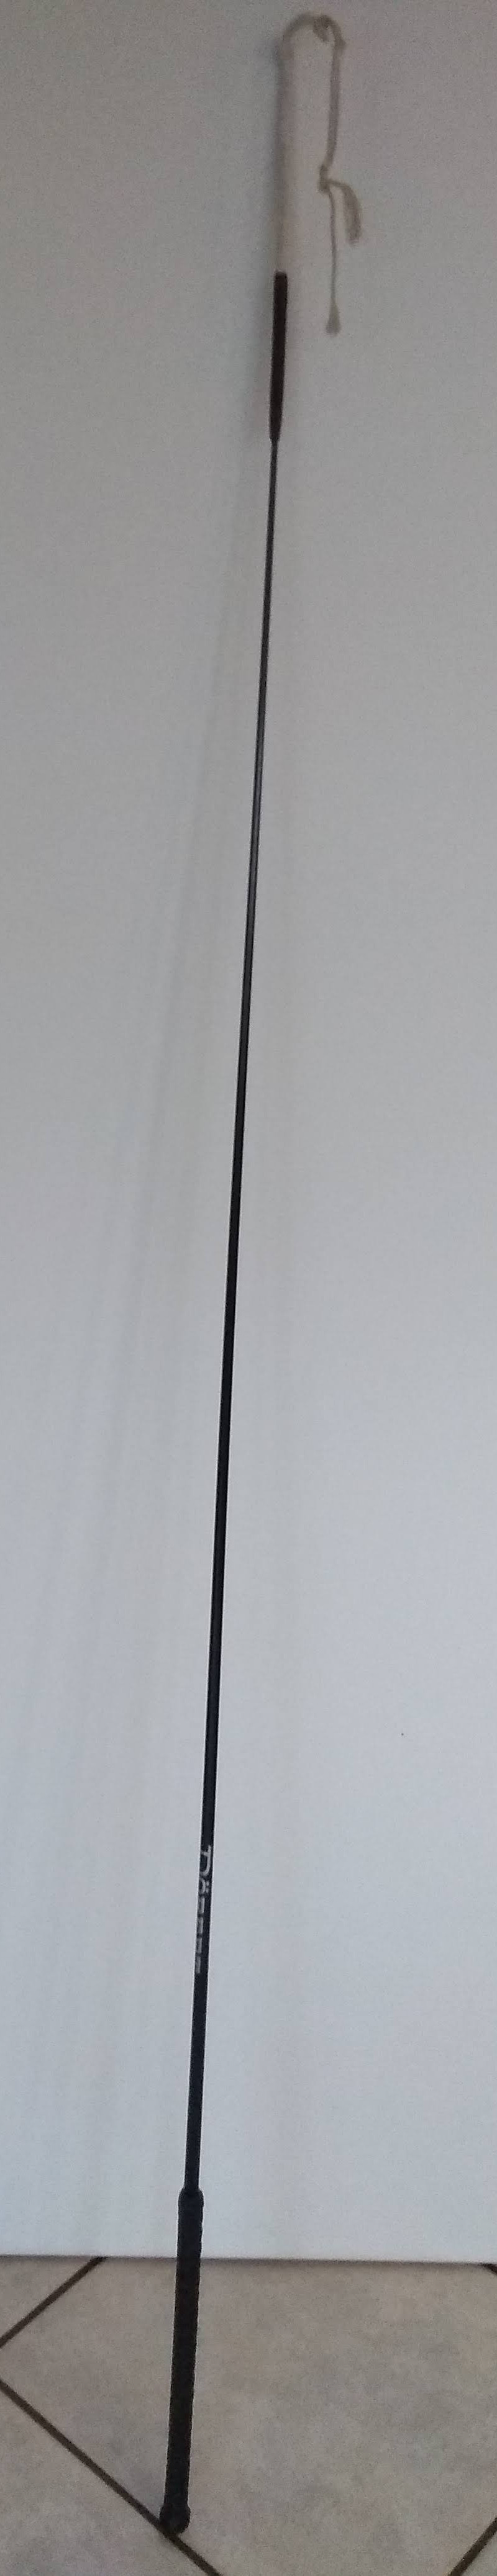 Döbert Bodenarbeitsgerte mit Ledergriff 1,50 m schwarz-neuwertig